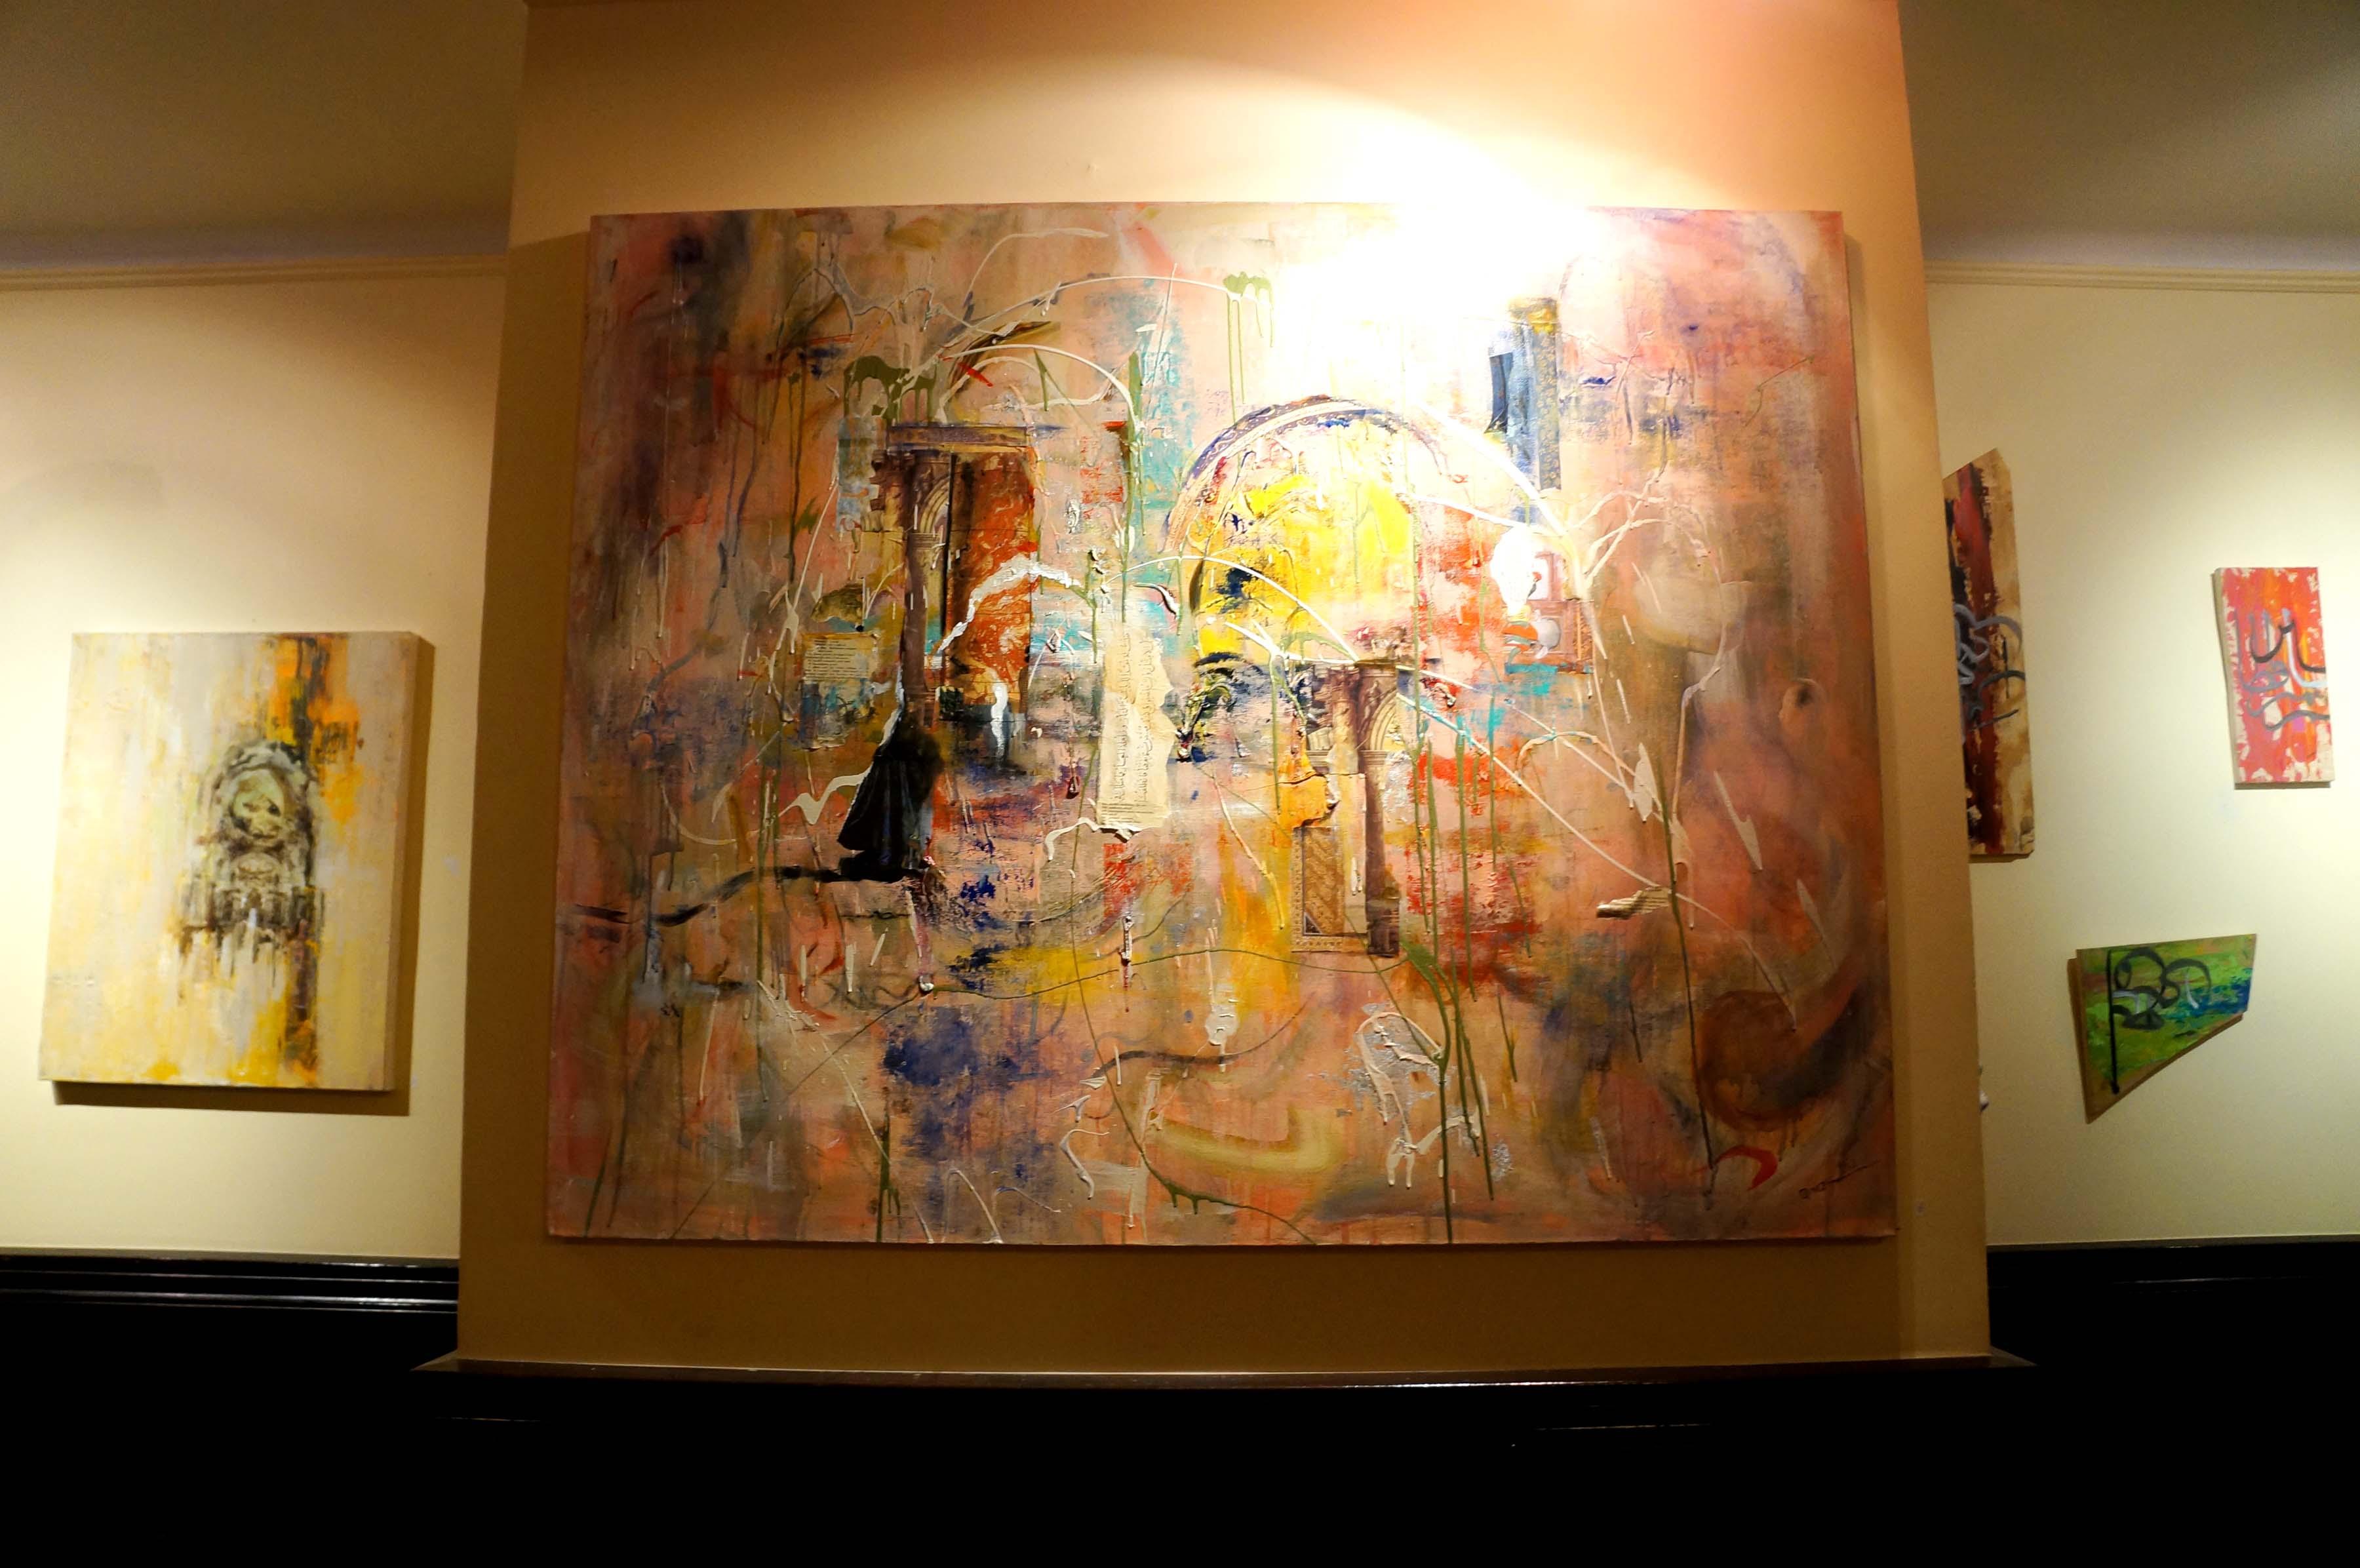 Paintings by Qinza Najm